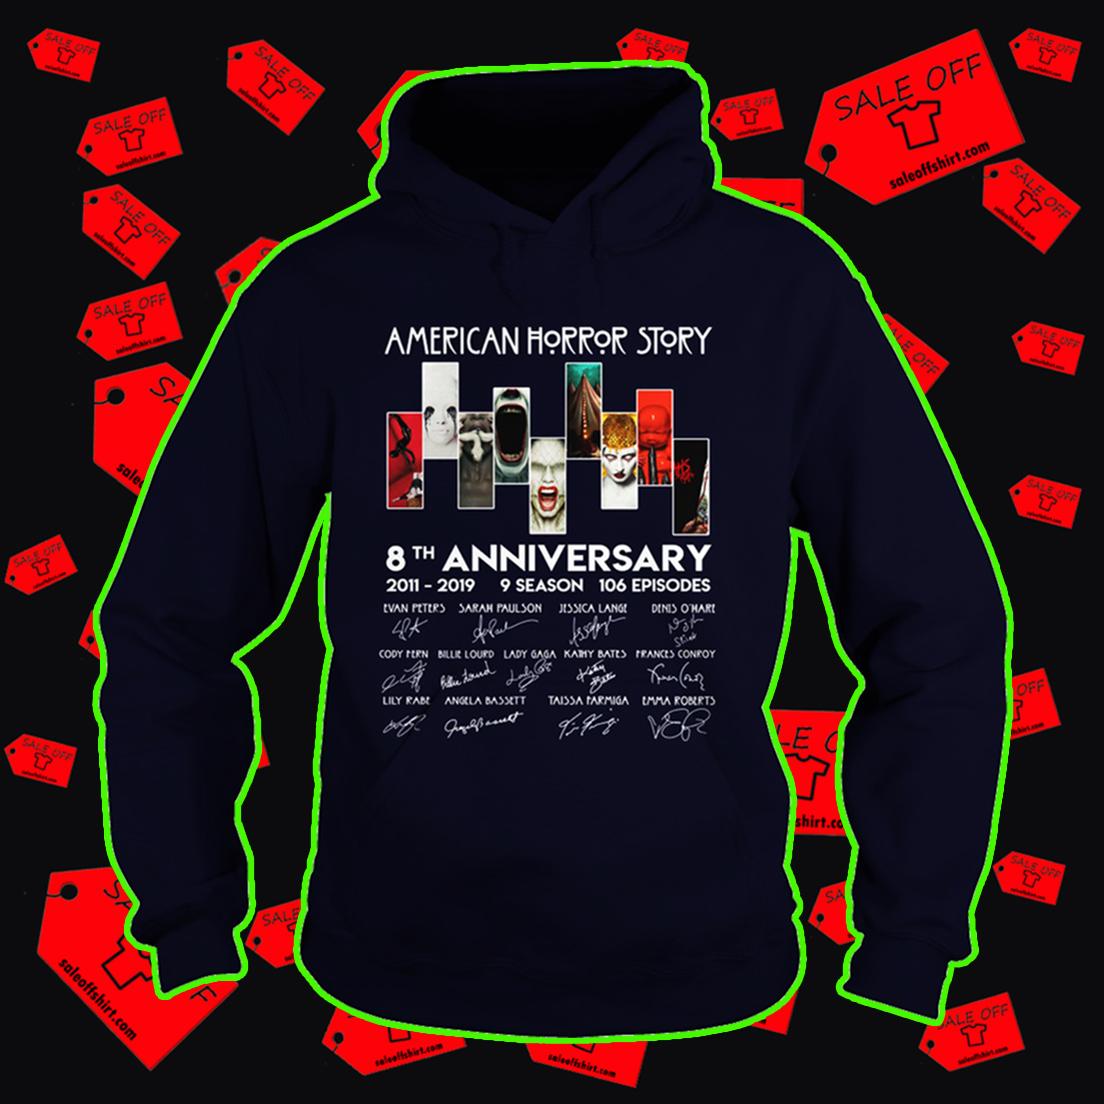 American horror story 8th anniversary hoodie